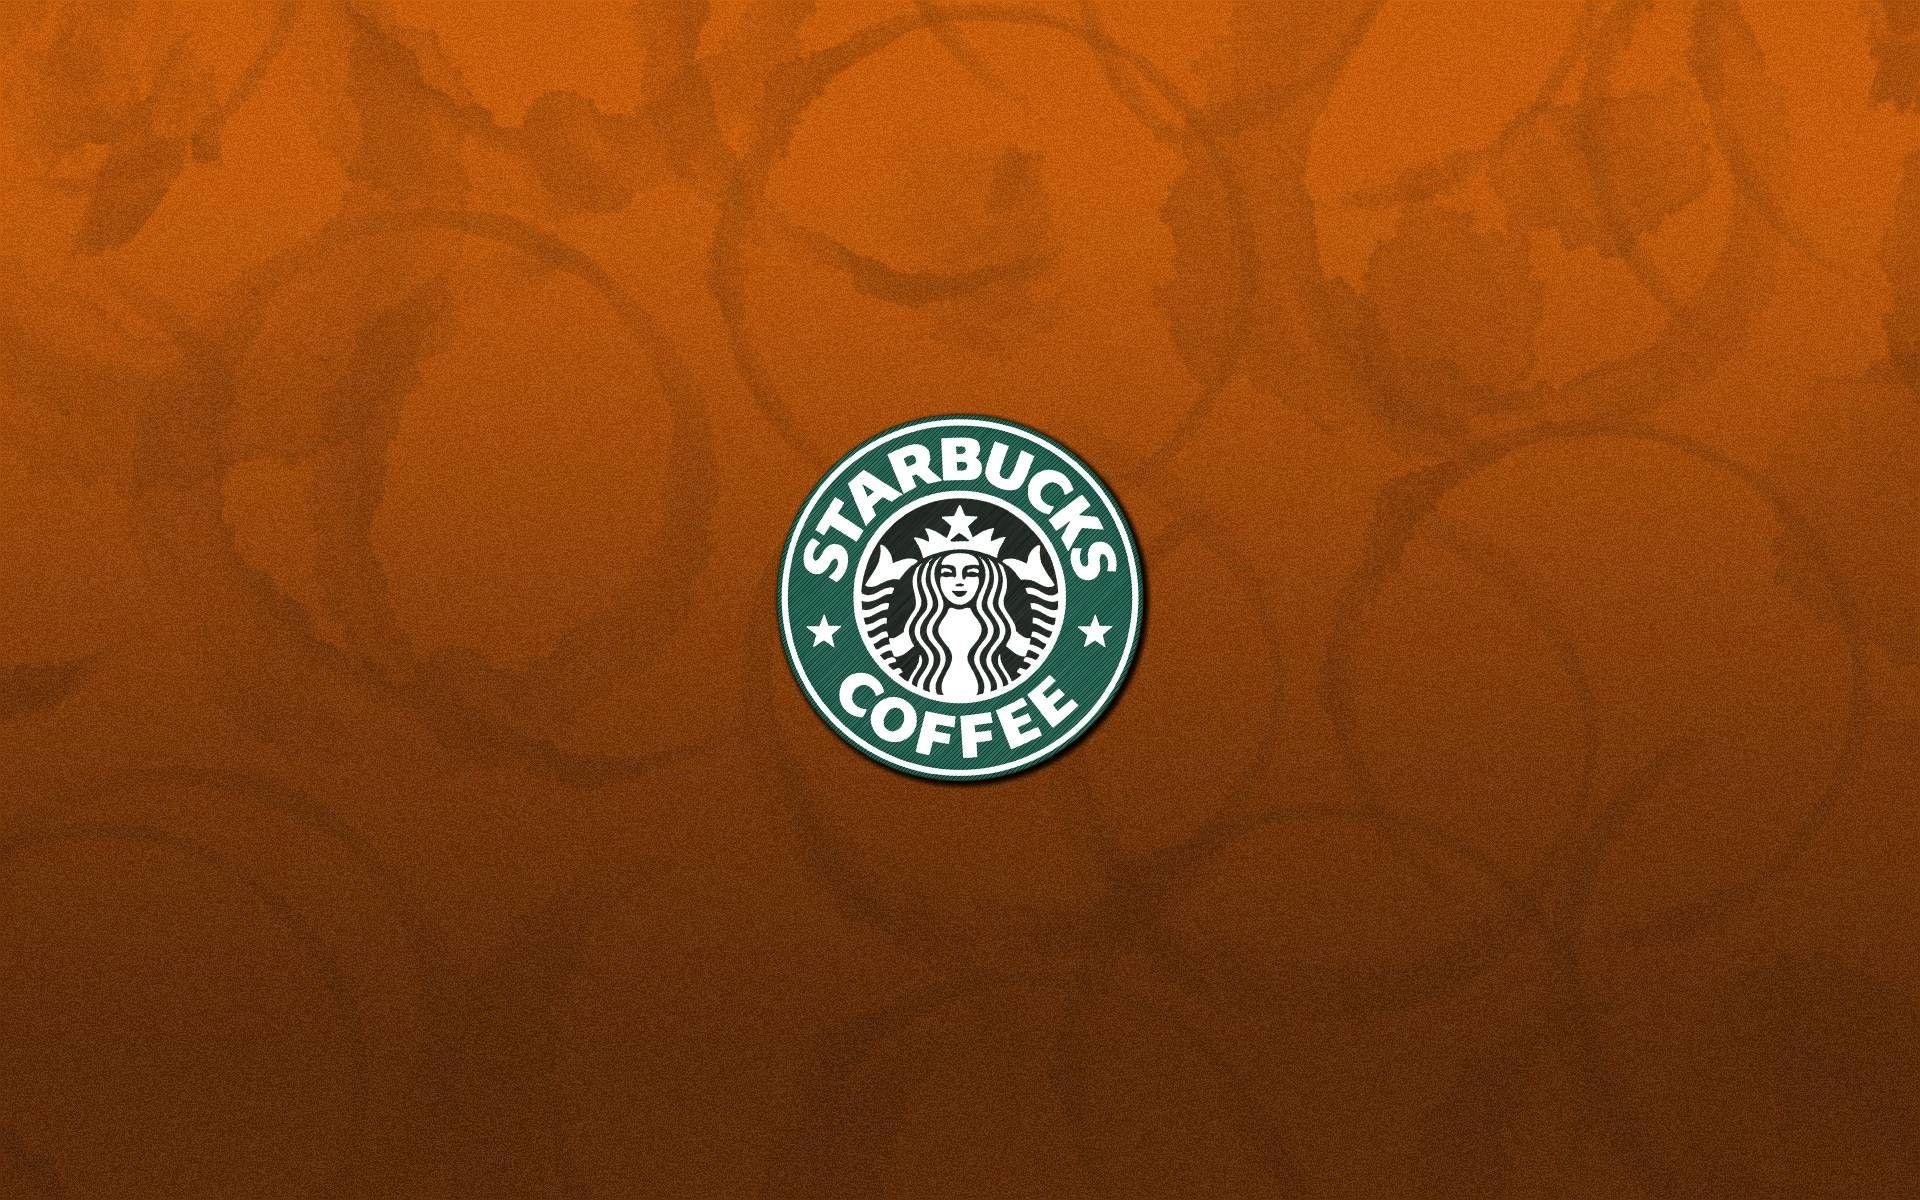 Cute Starbucks Background Wide 2021 Live Wallpaper Hd Starbucks Wallpaper Starbucks Background Starbucks Logo